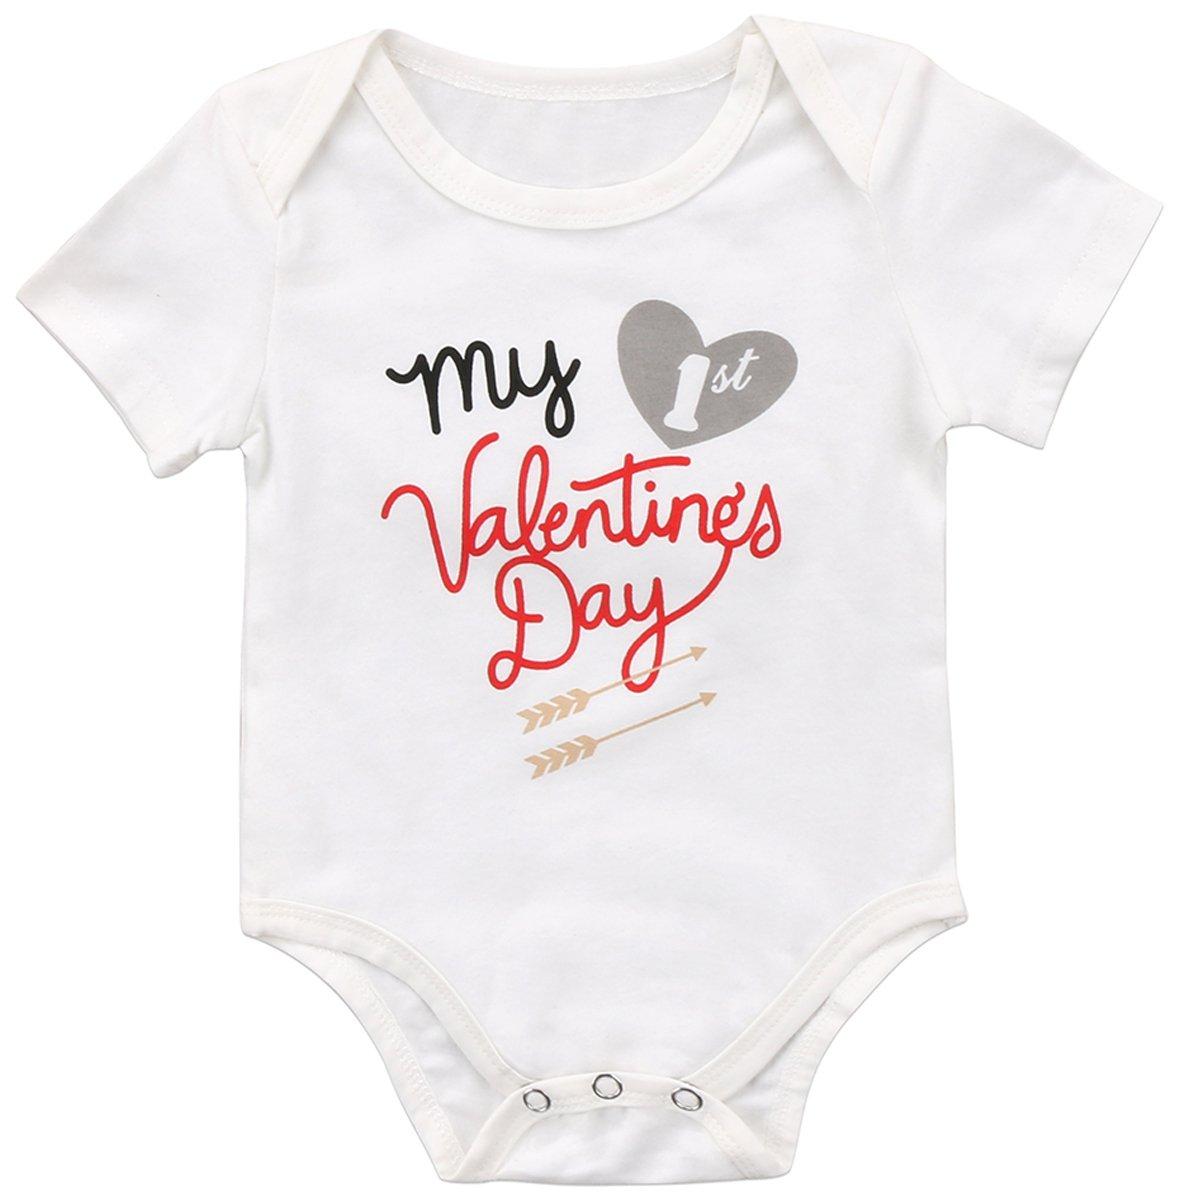 Annvivi Newborn Baby Boys Girls Clothes My 1st Valentine's Short Sleeve Romper Outfits